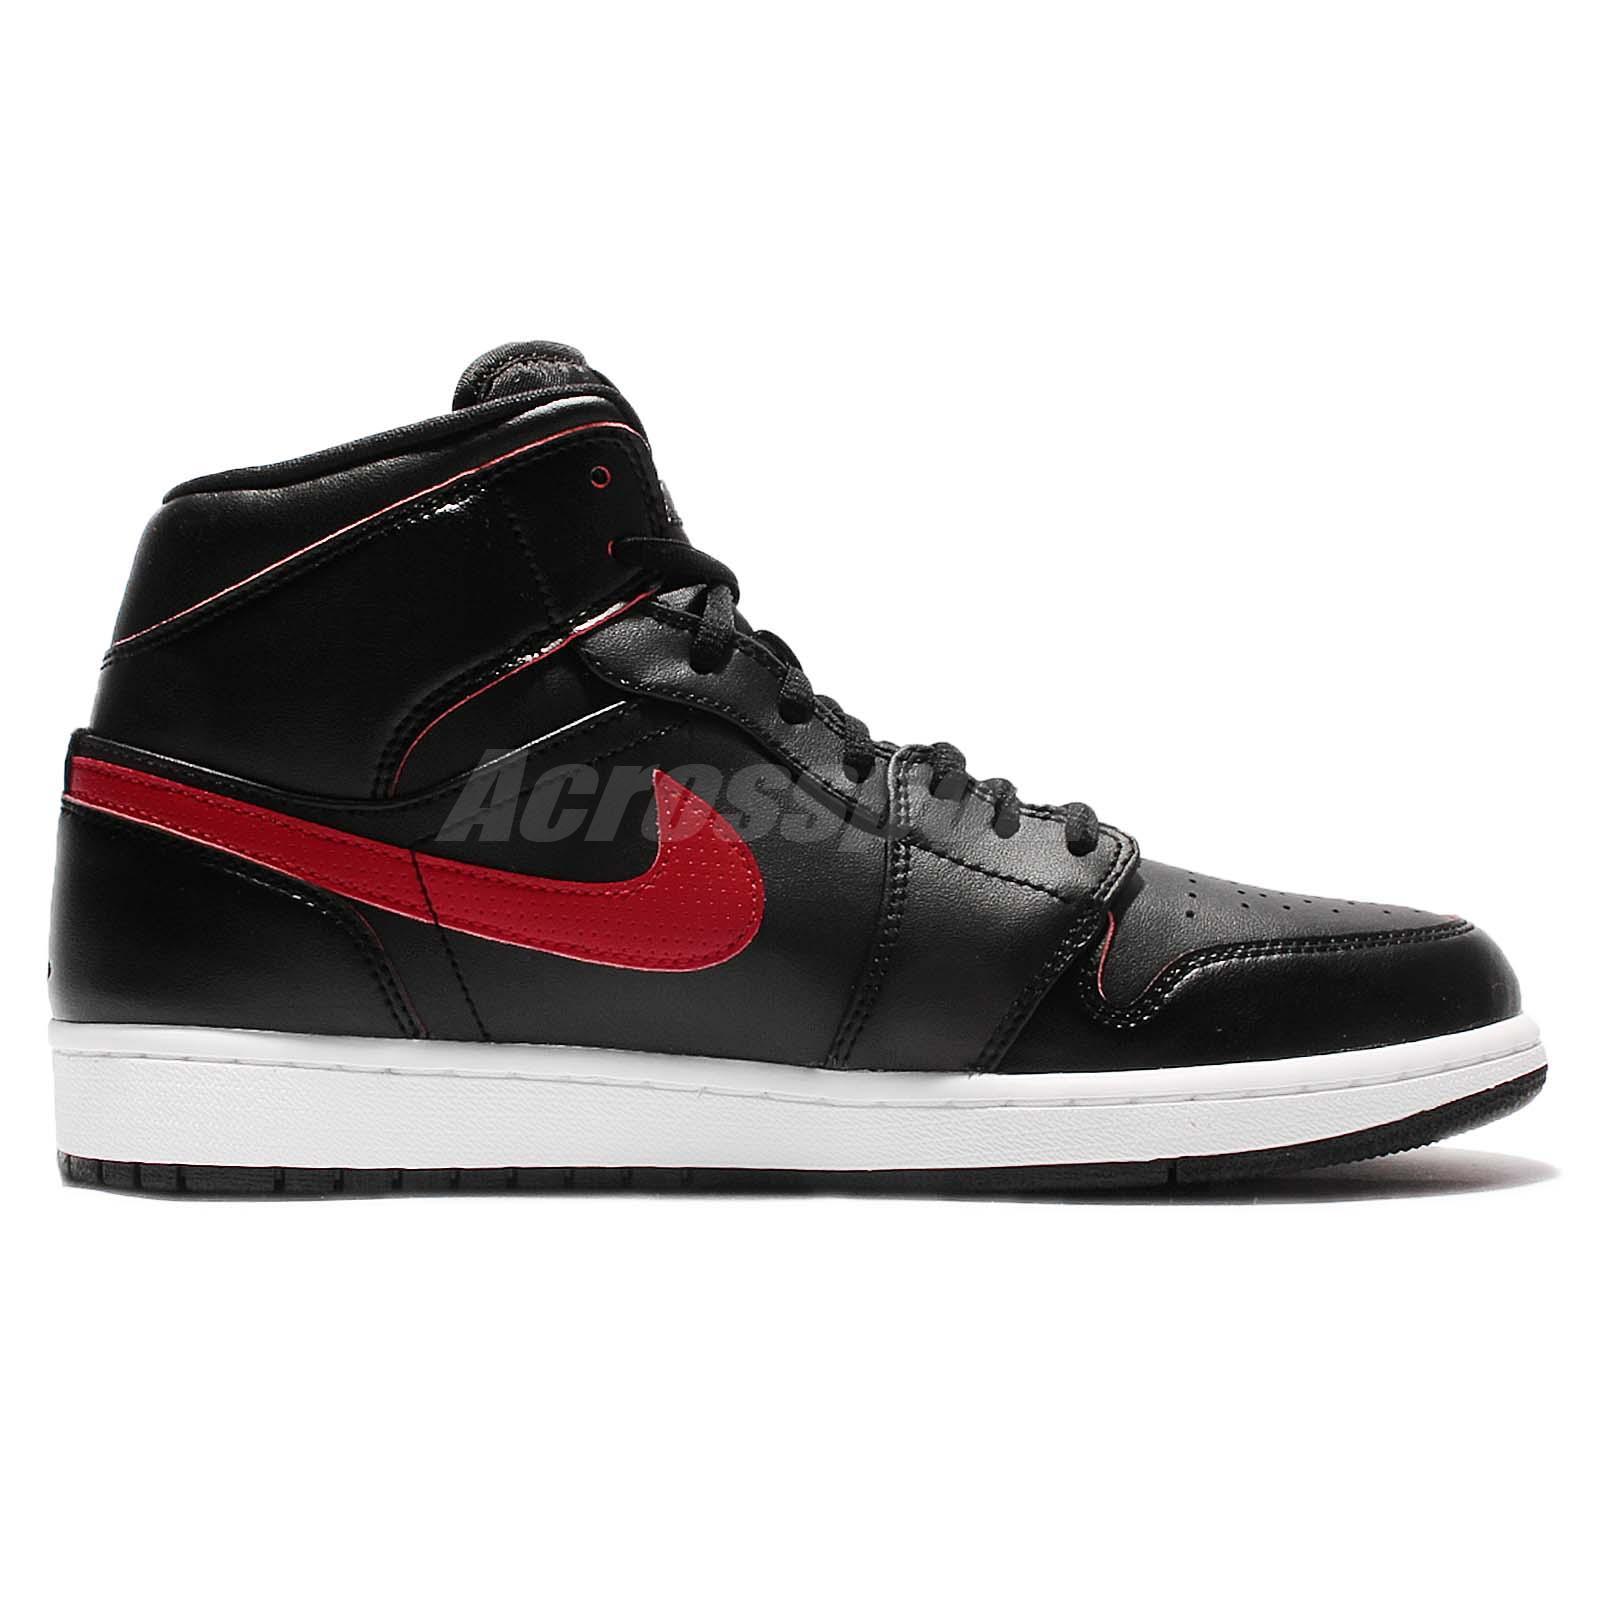 Cheap Venettini Shoes